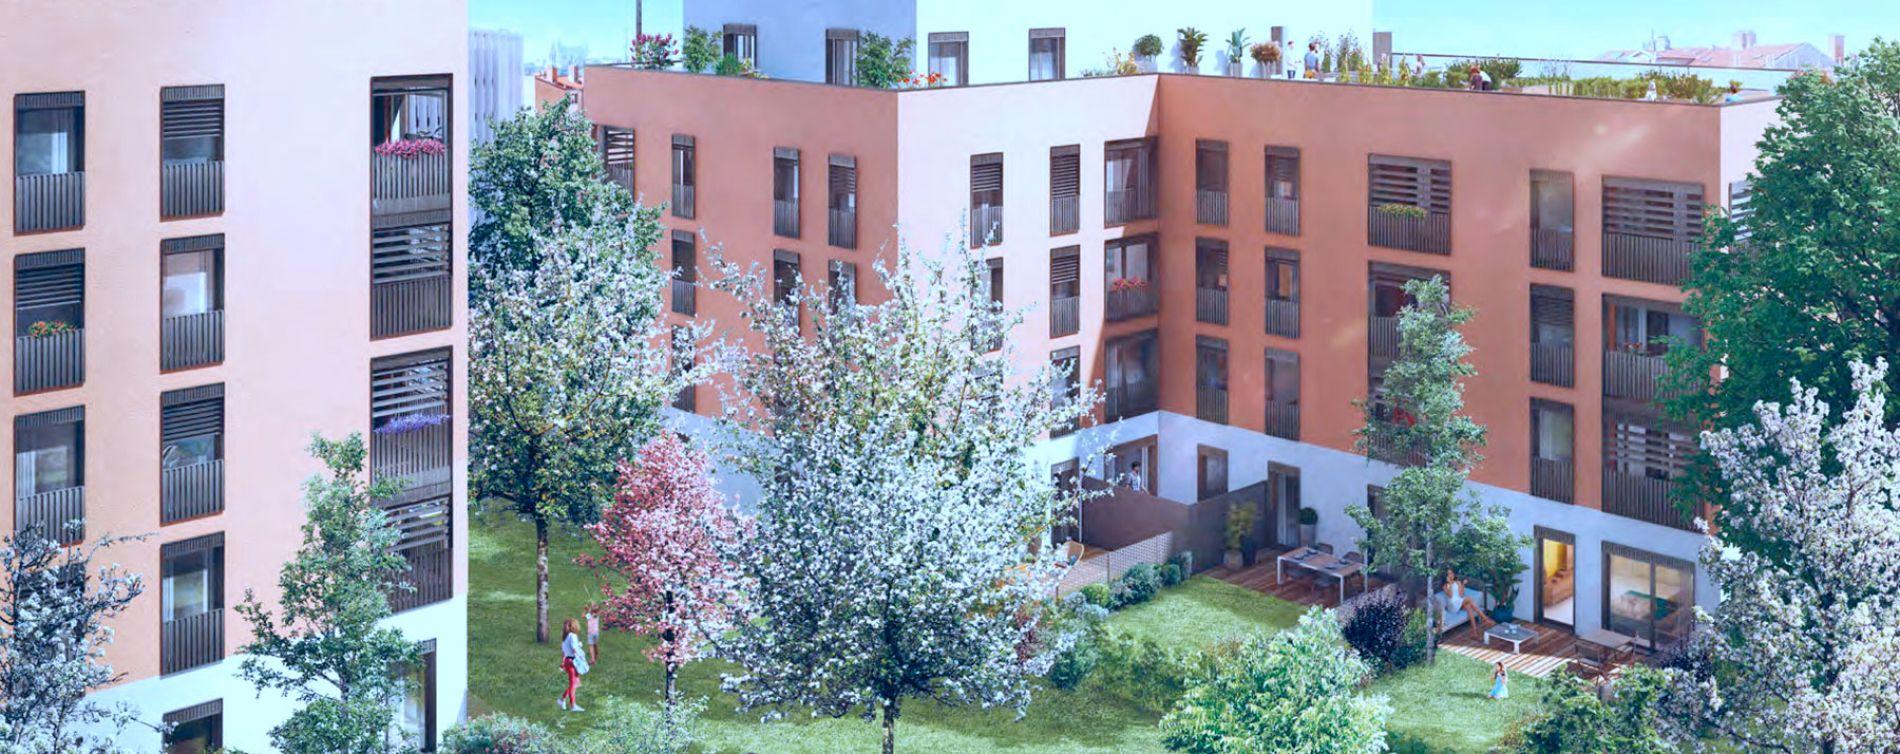 Lyon : programme immobilier neuve « Programme immobilier n°216405 » (5)